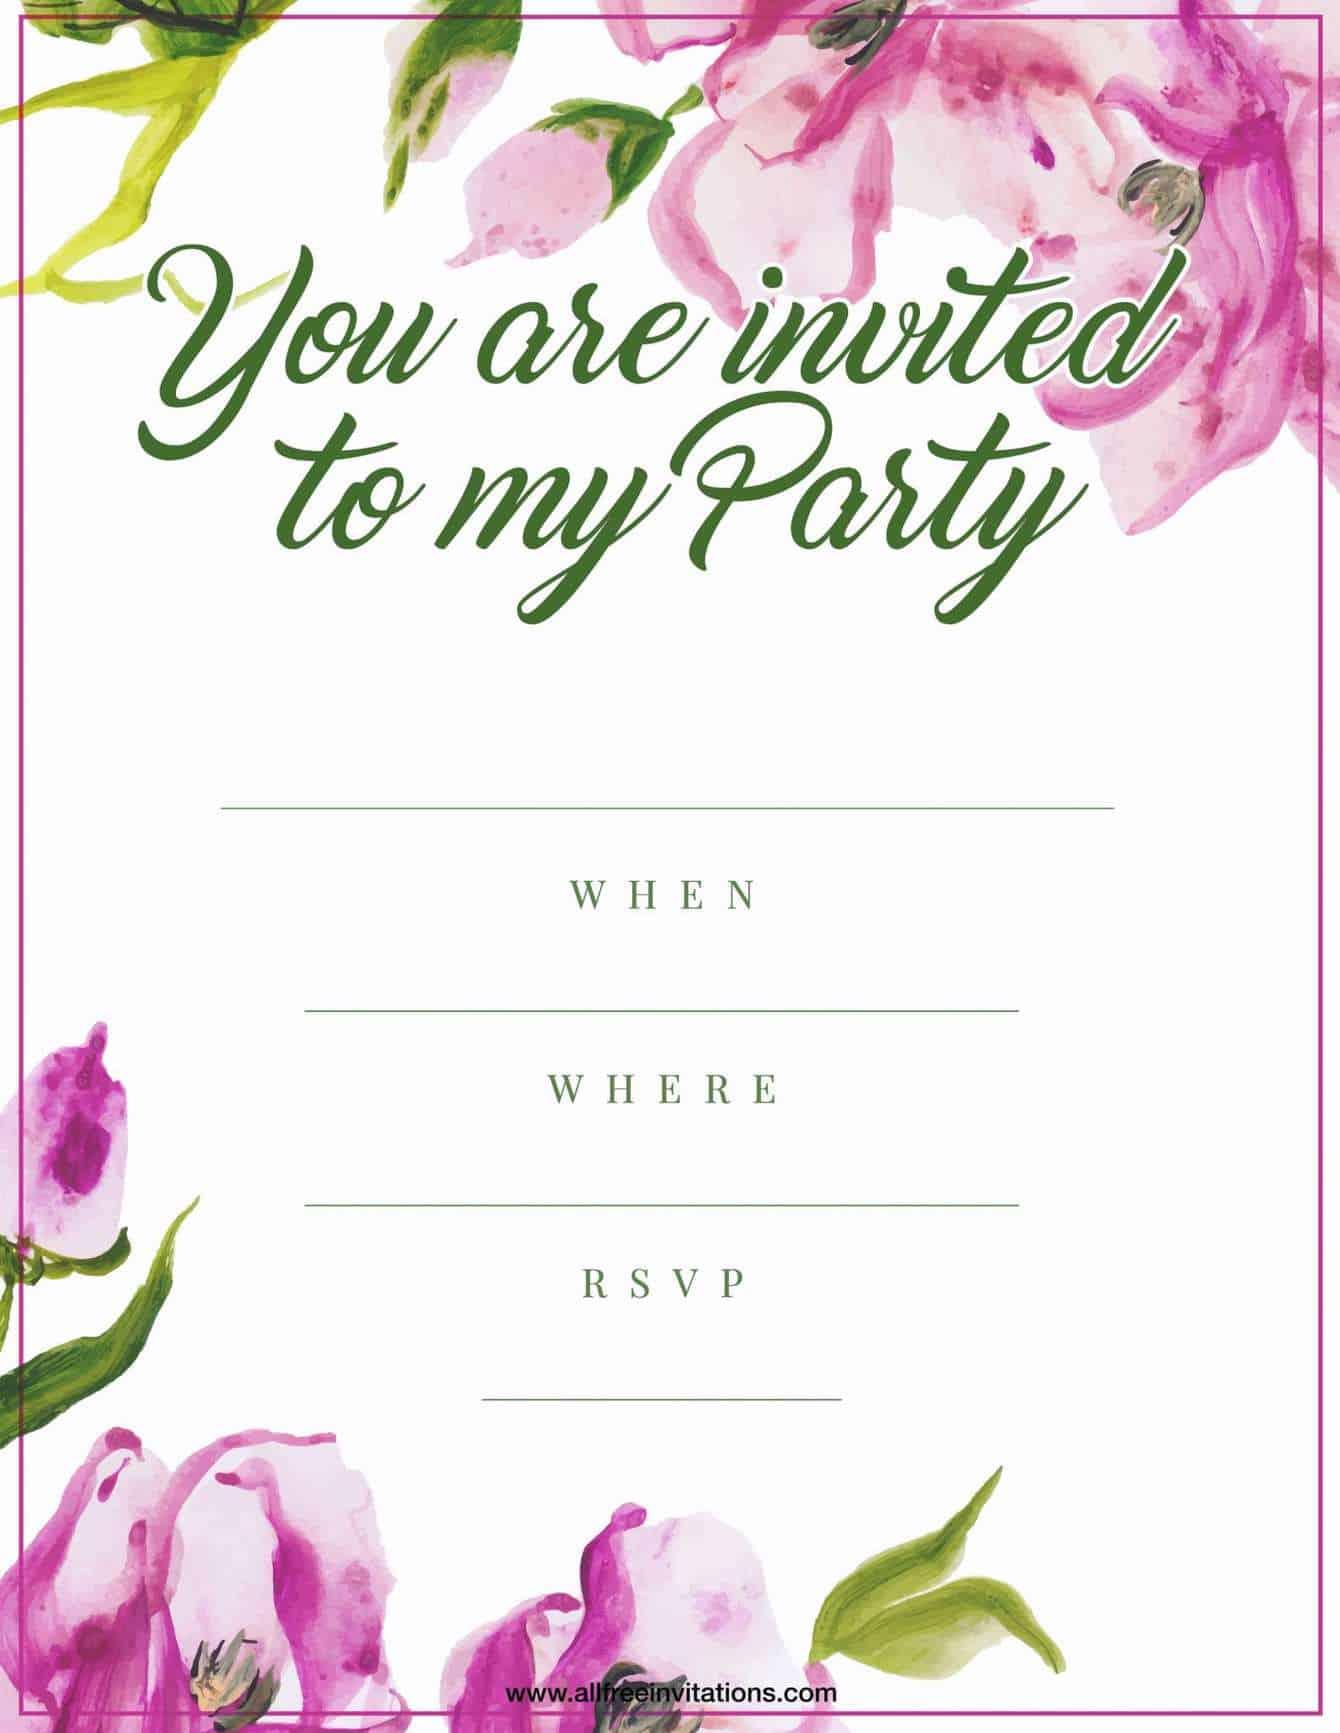 http://allfreeinvitations.com/wp-content/uploads/2018/03/Birthday-Party-Invitation-Pink-Floral-Design.jpg